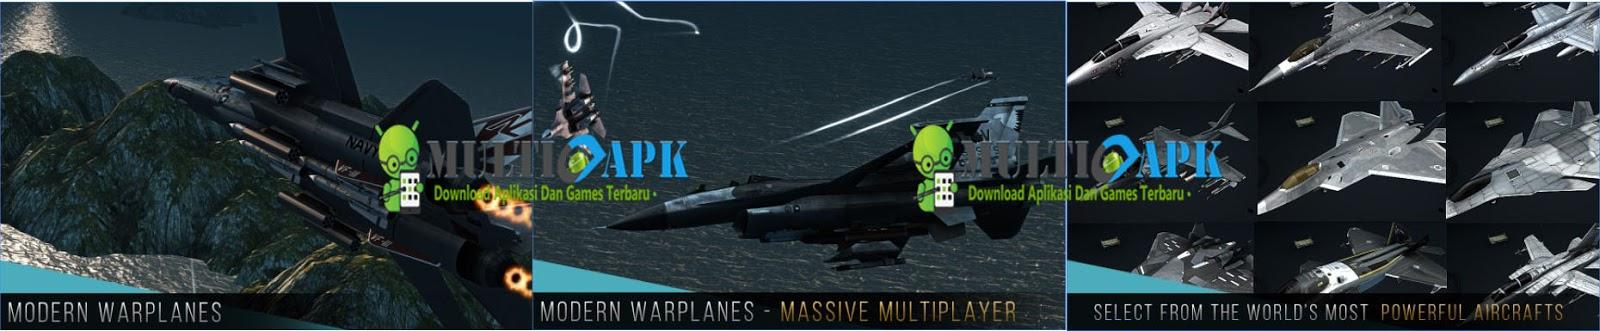 Modern Warplanes Apk Mod 1.5 Free Shopping